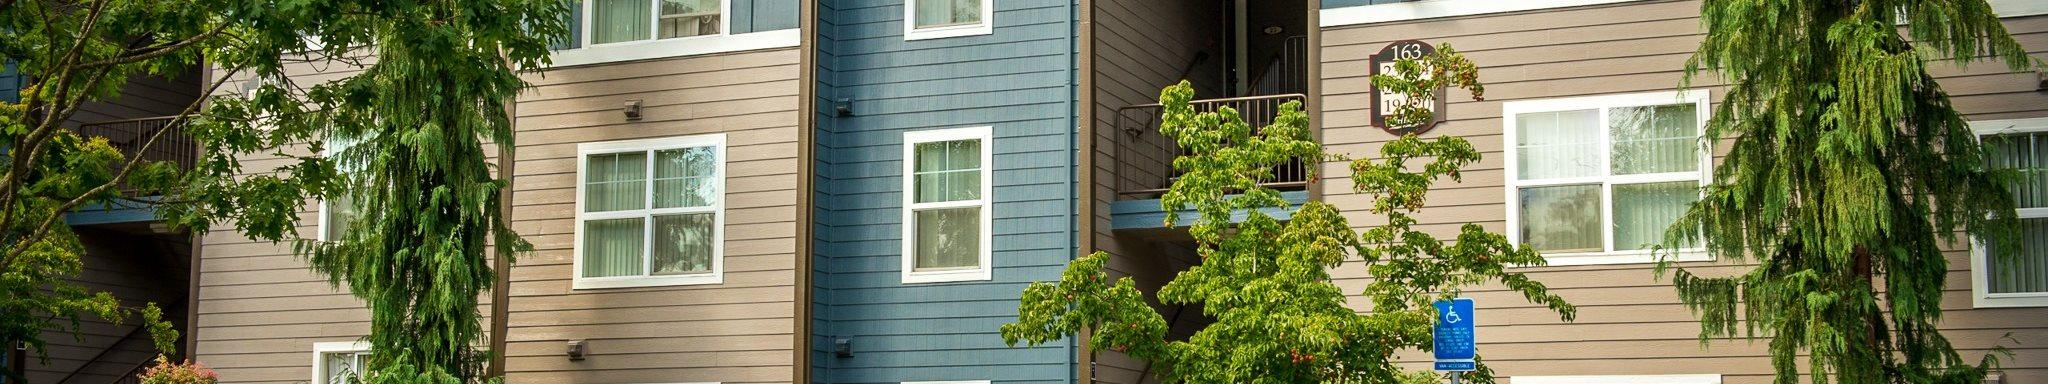 Stillwater Apartments Building Exteriors